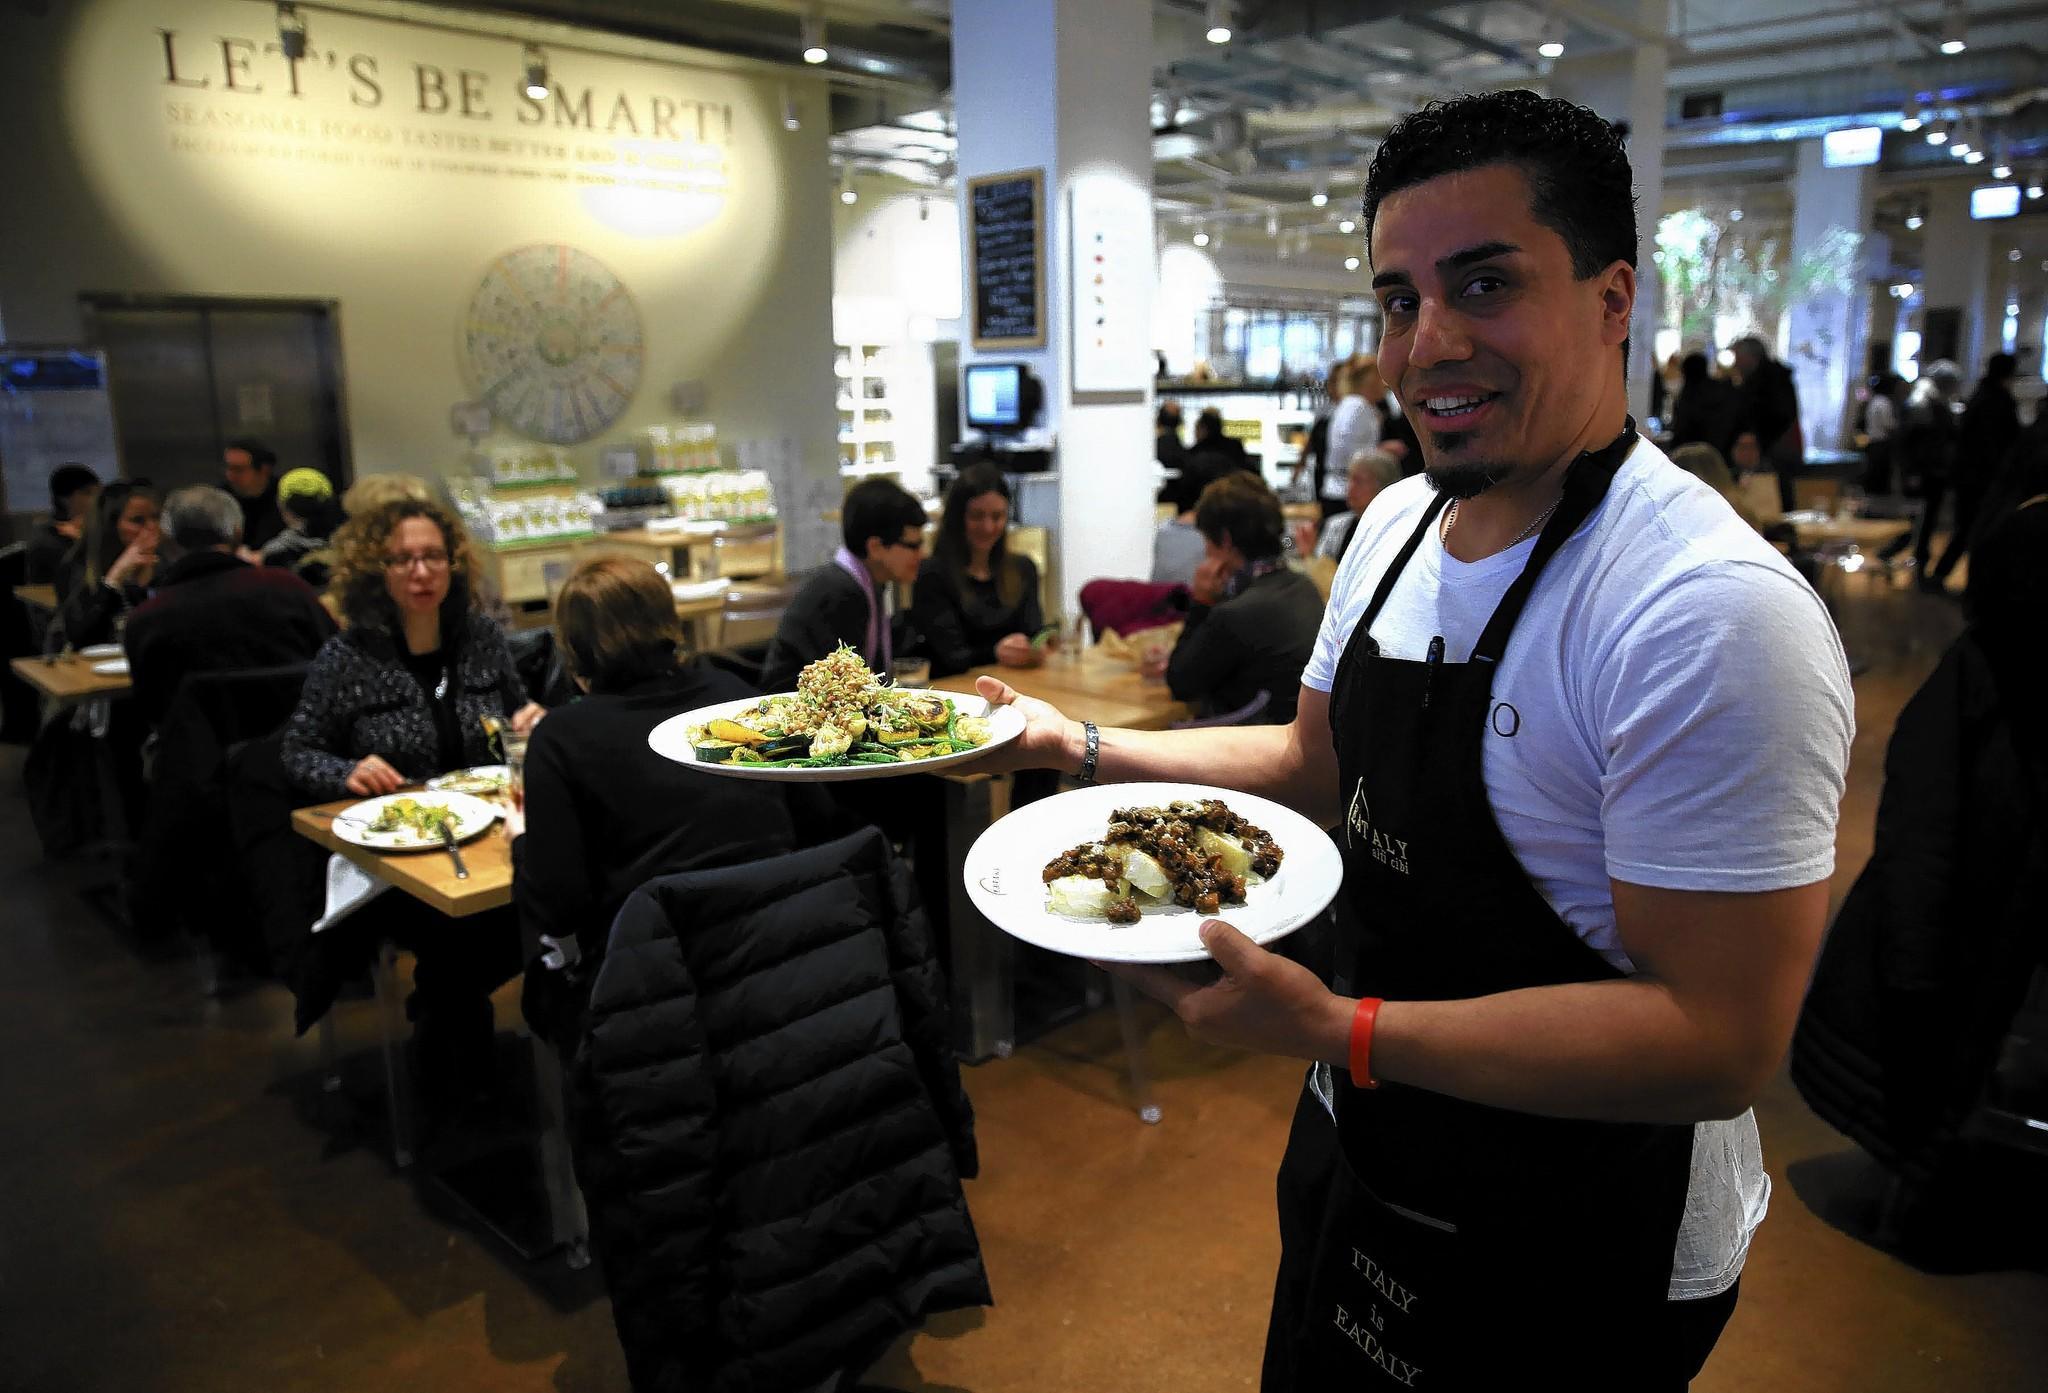 Mauricio Paredes serves meals at Le Verdure, a vegetarian restaurant at Eataly, an Italian marketplace.